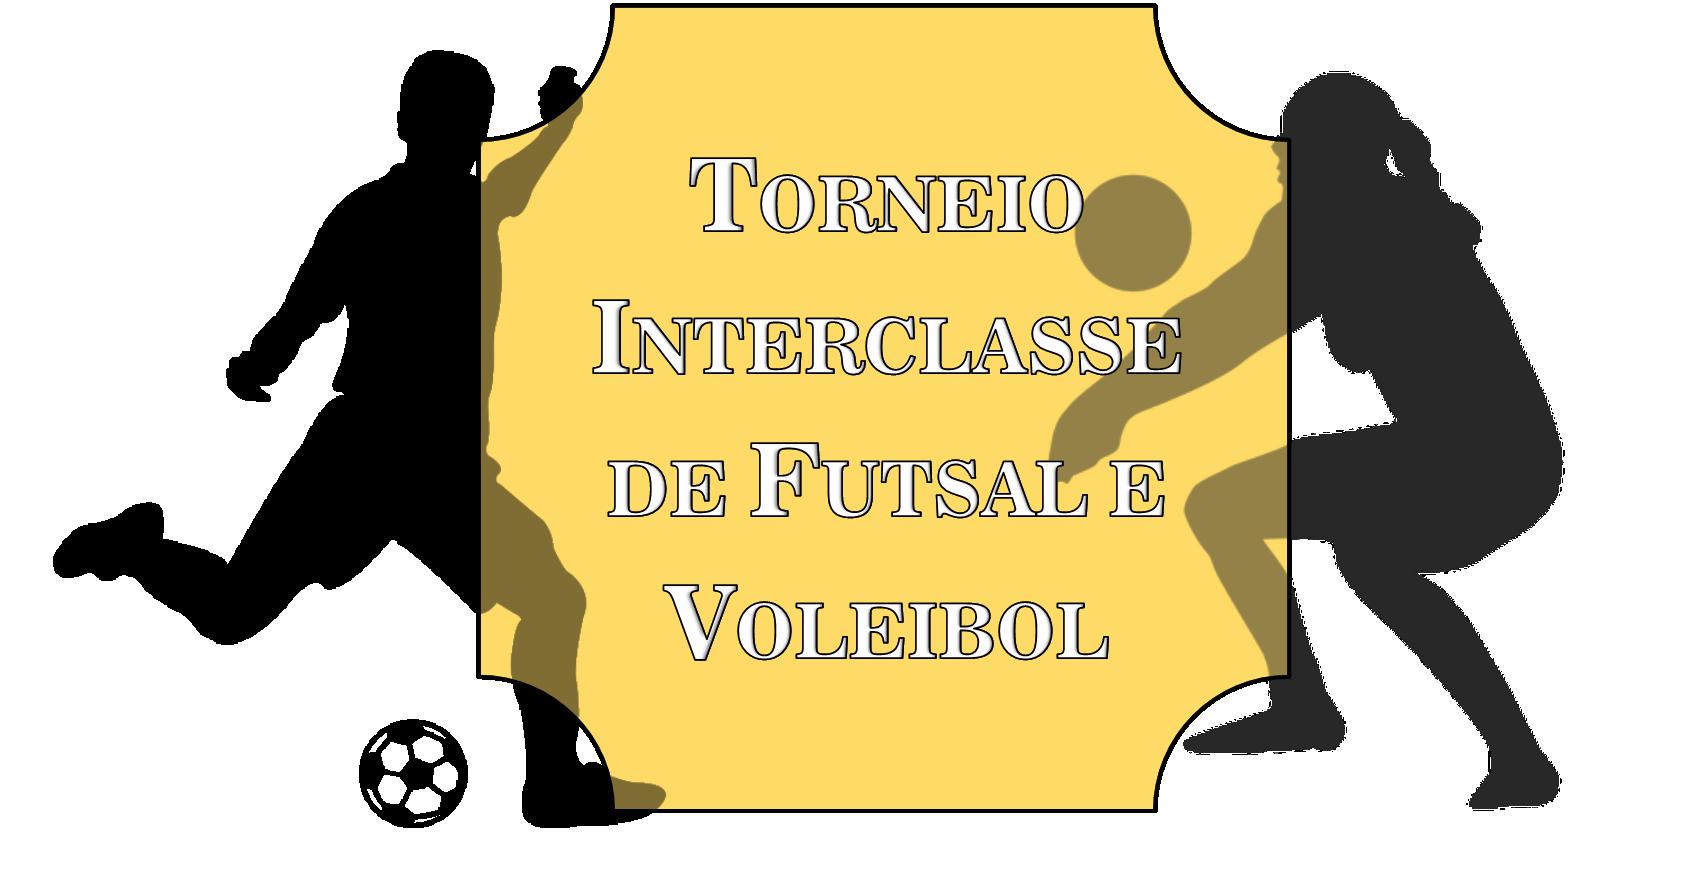 Torneio Interclasse de Futsal e Voleibol